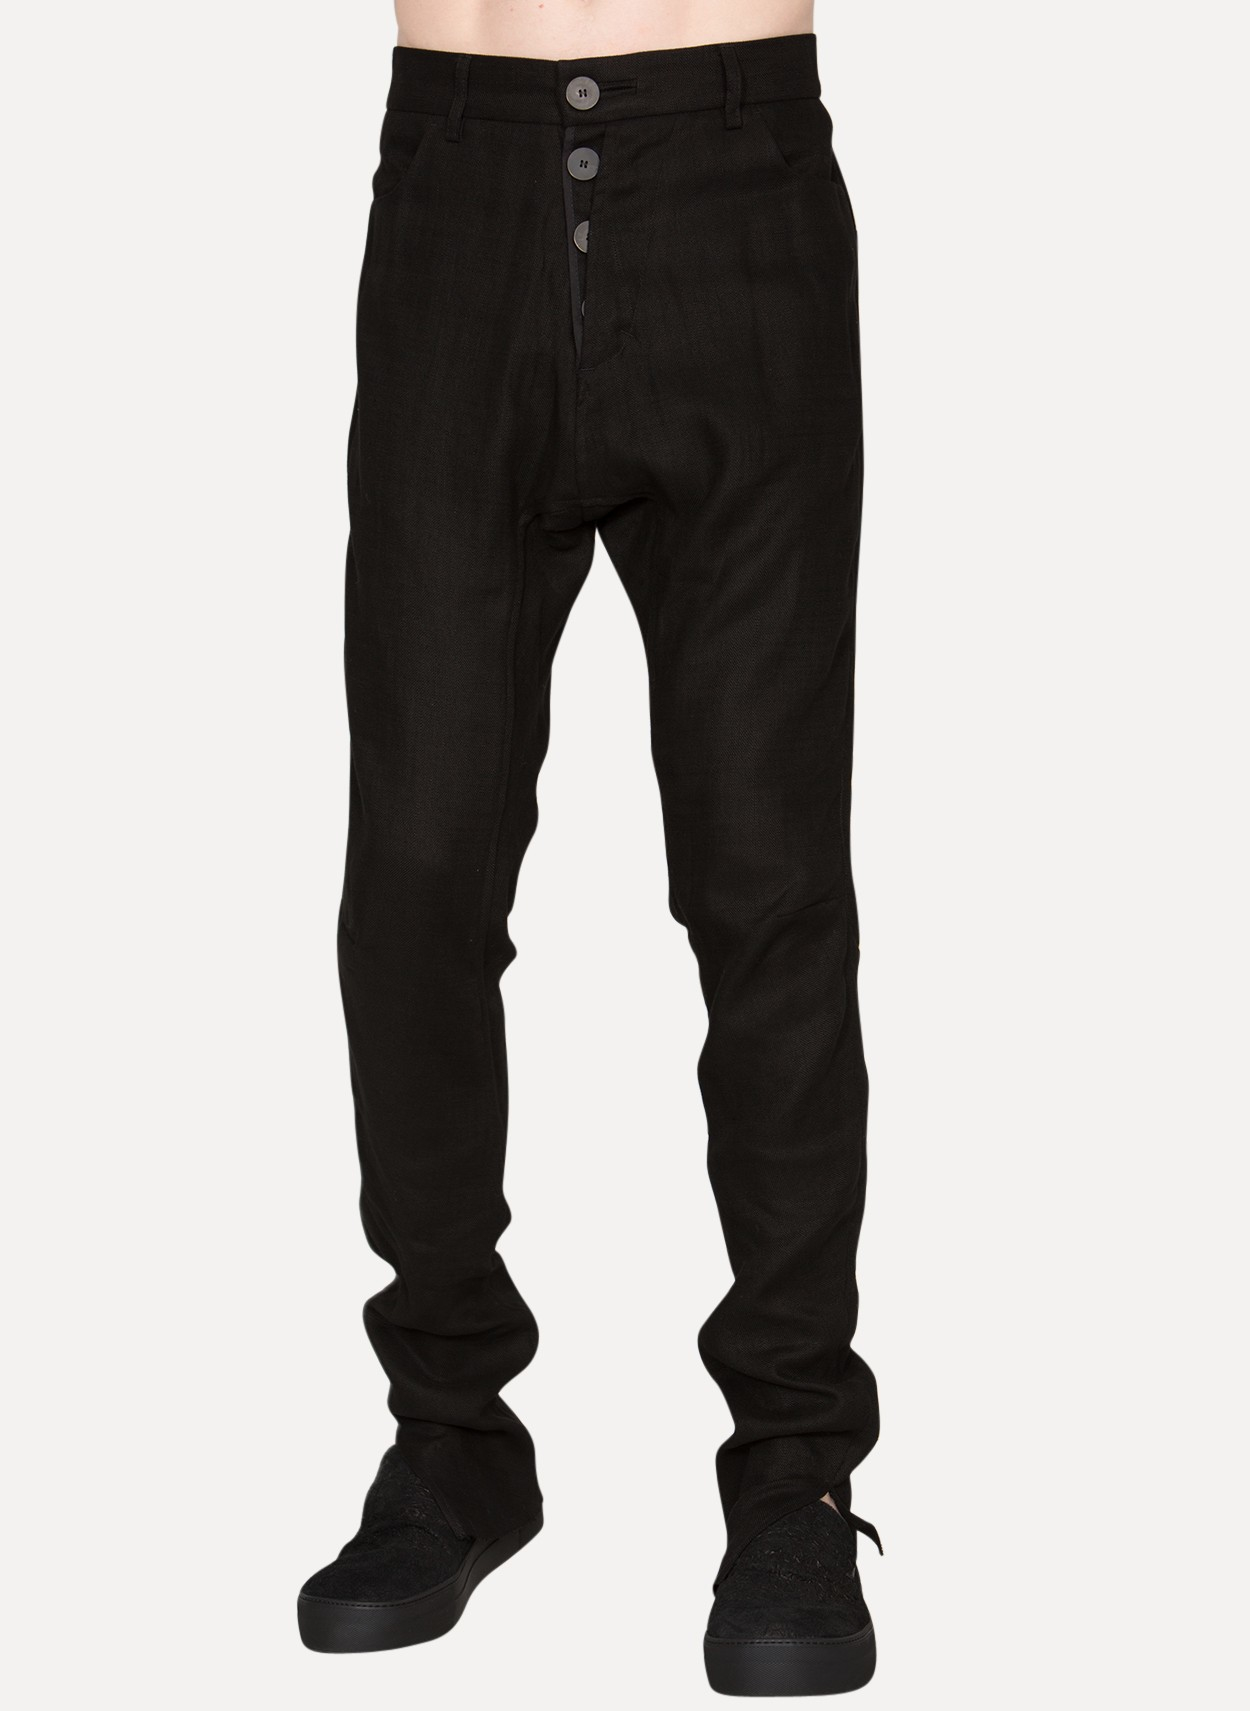 0087a110e81 Cedric jacquemyn Knee-dart Pants in Black for Men